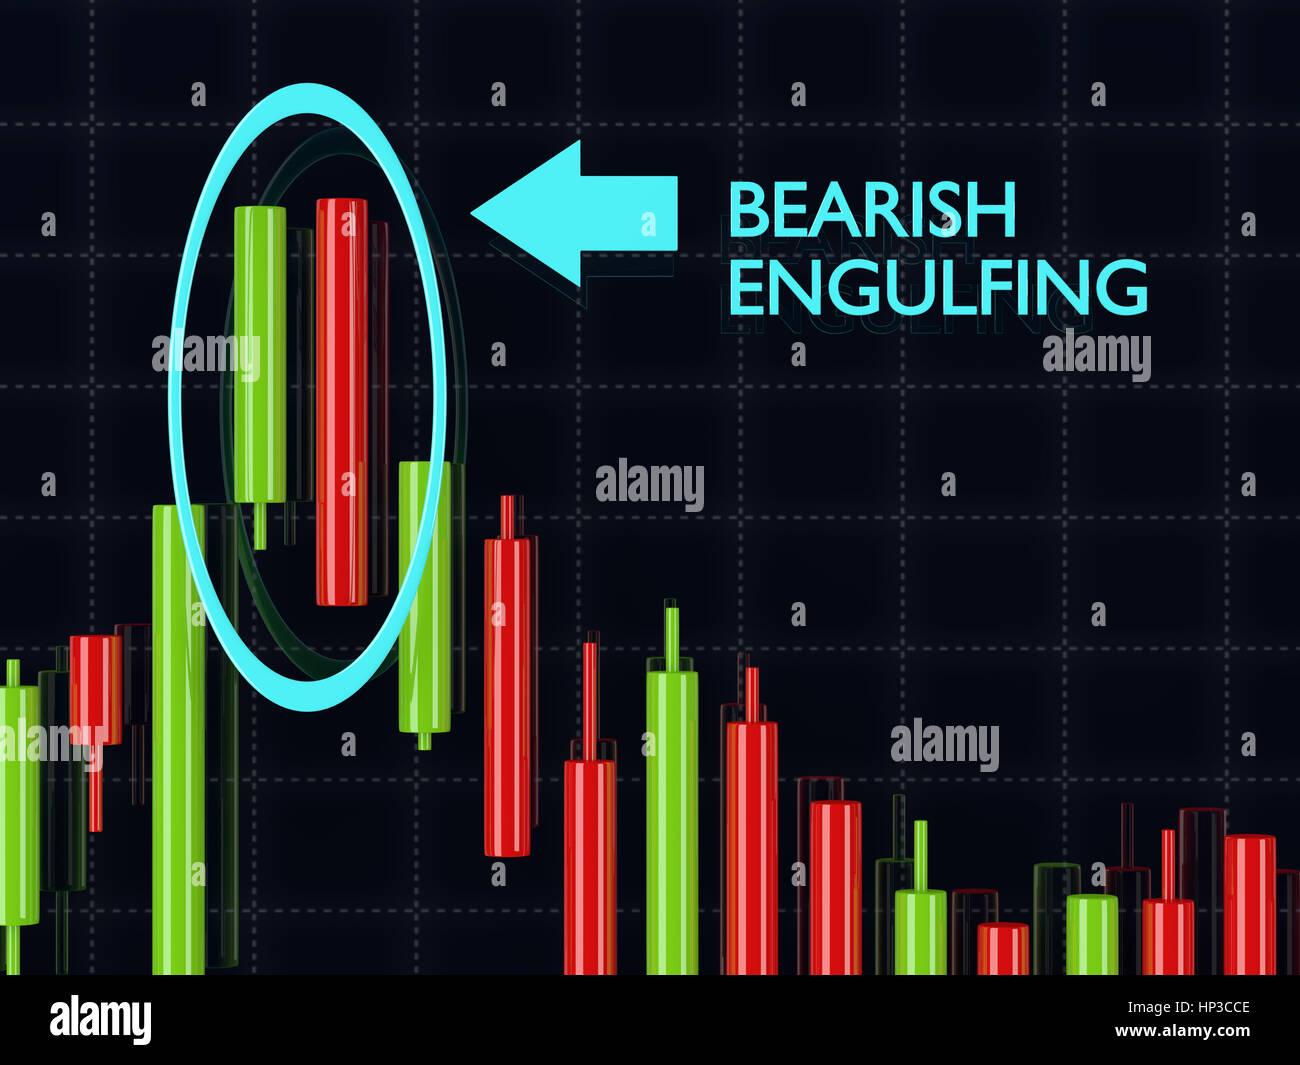 3d rendering of forex candlestick bearish engulfing pattern over dark background - Stock Image